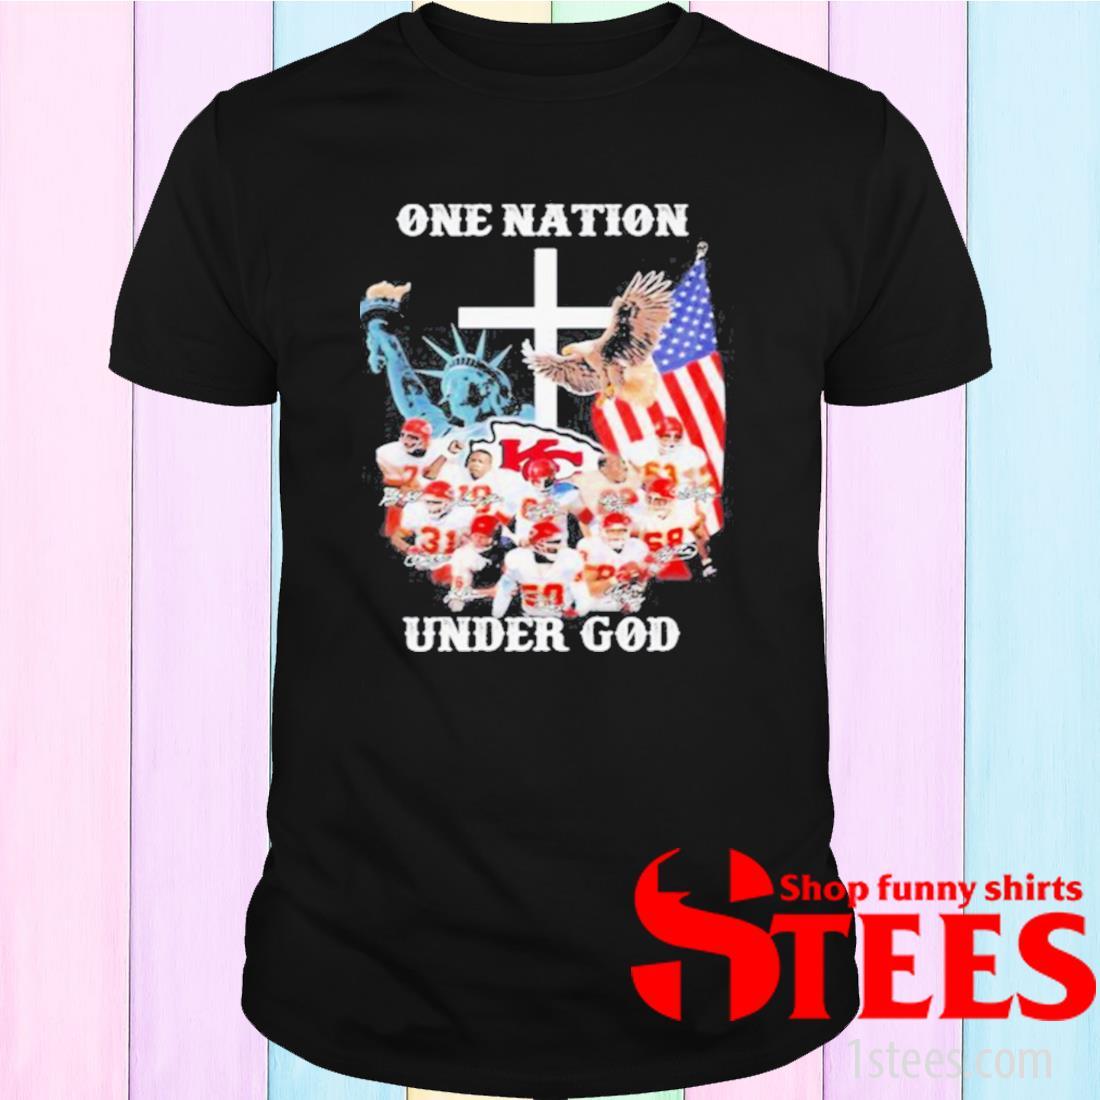 One Nation Under God Kansas City Chiefs Signature Shirt